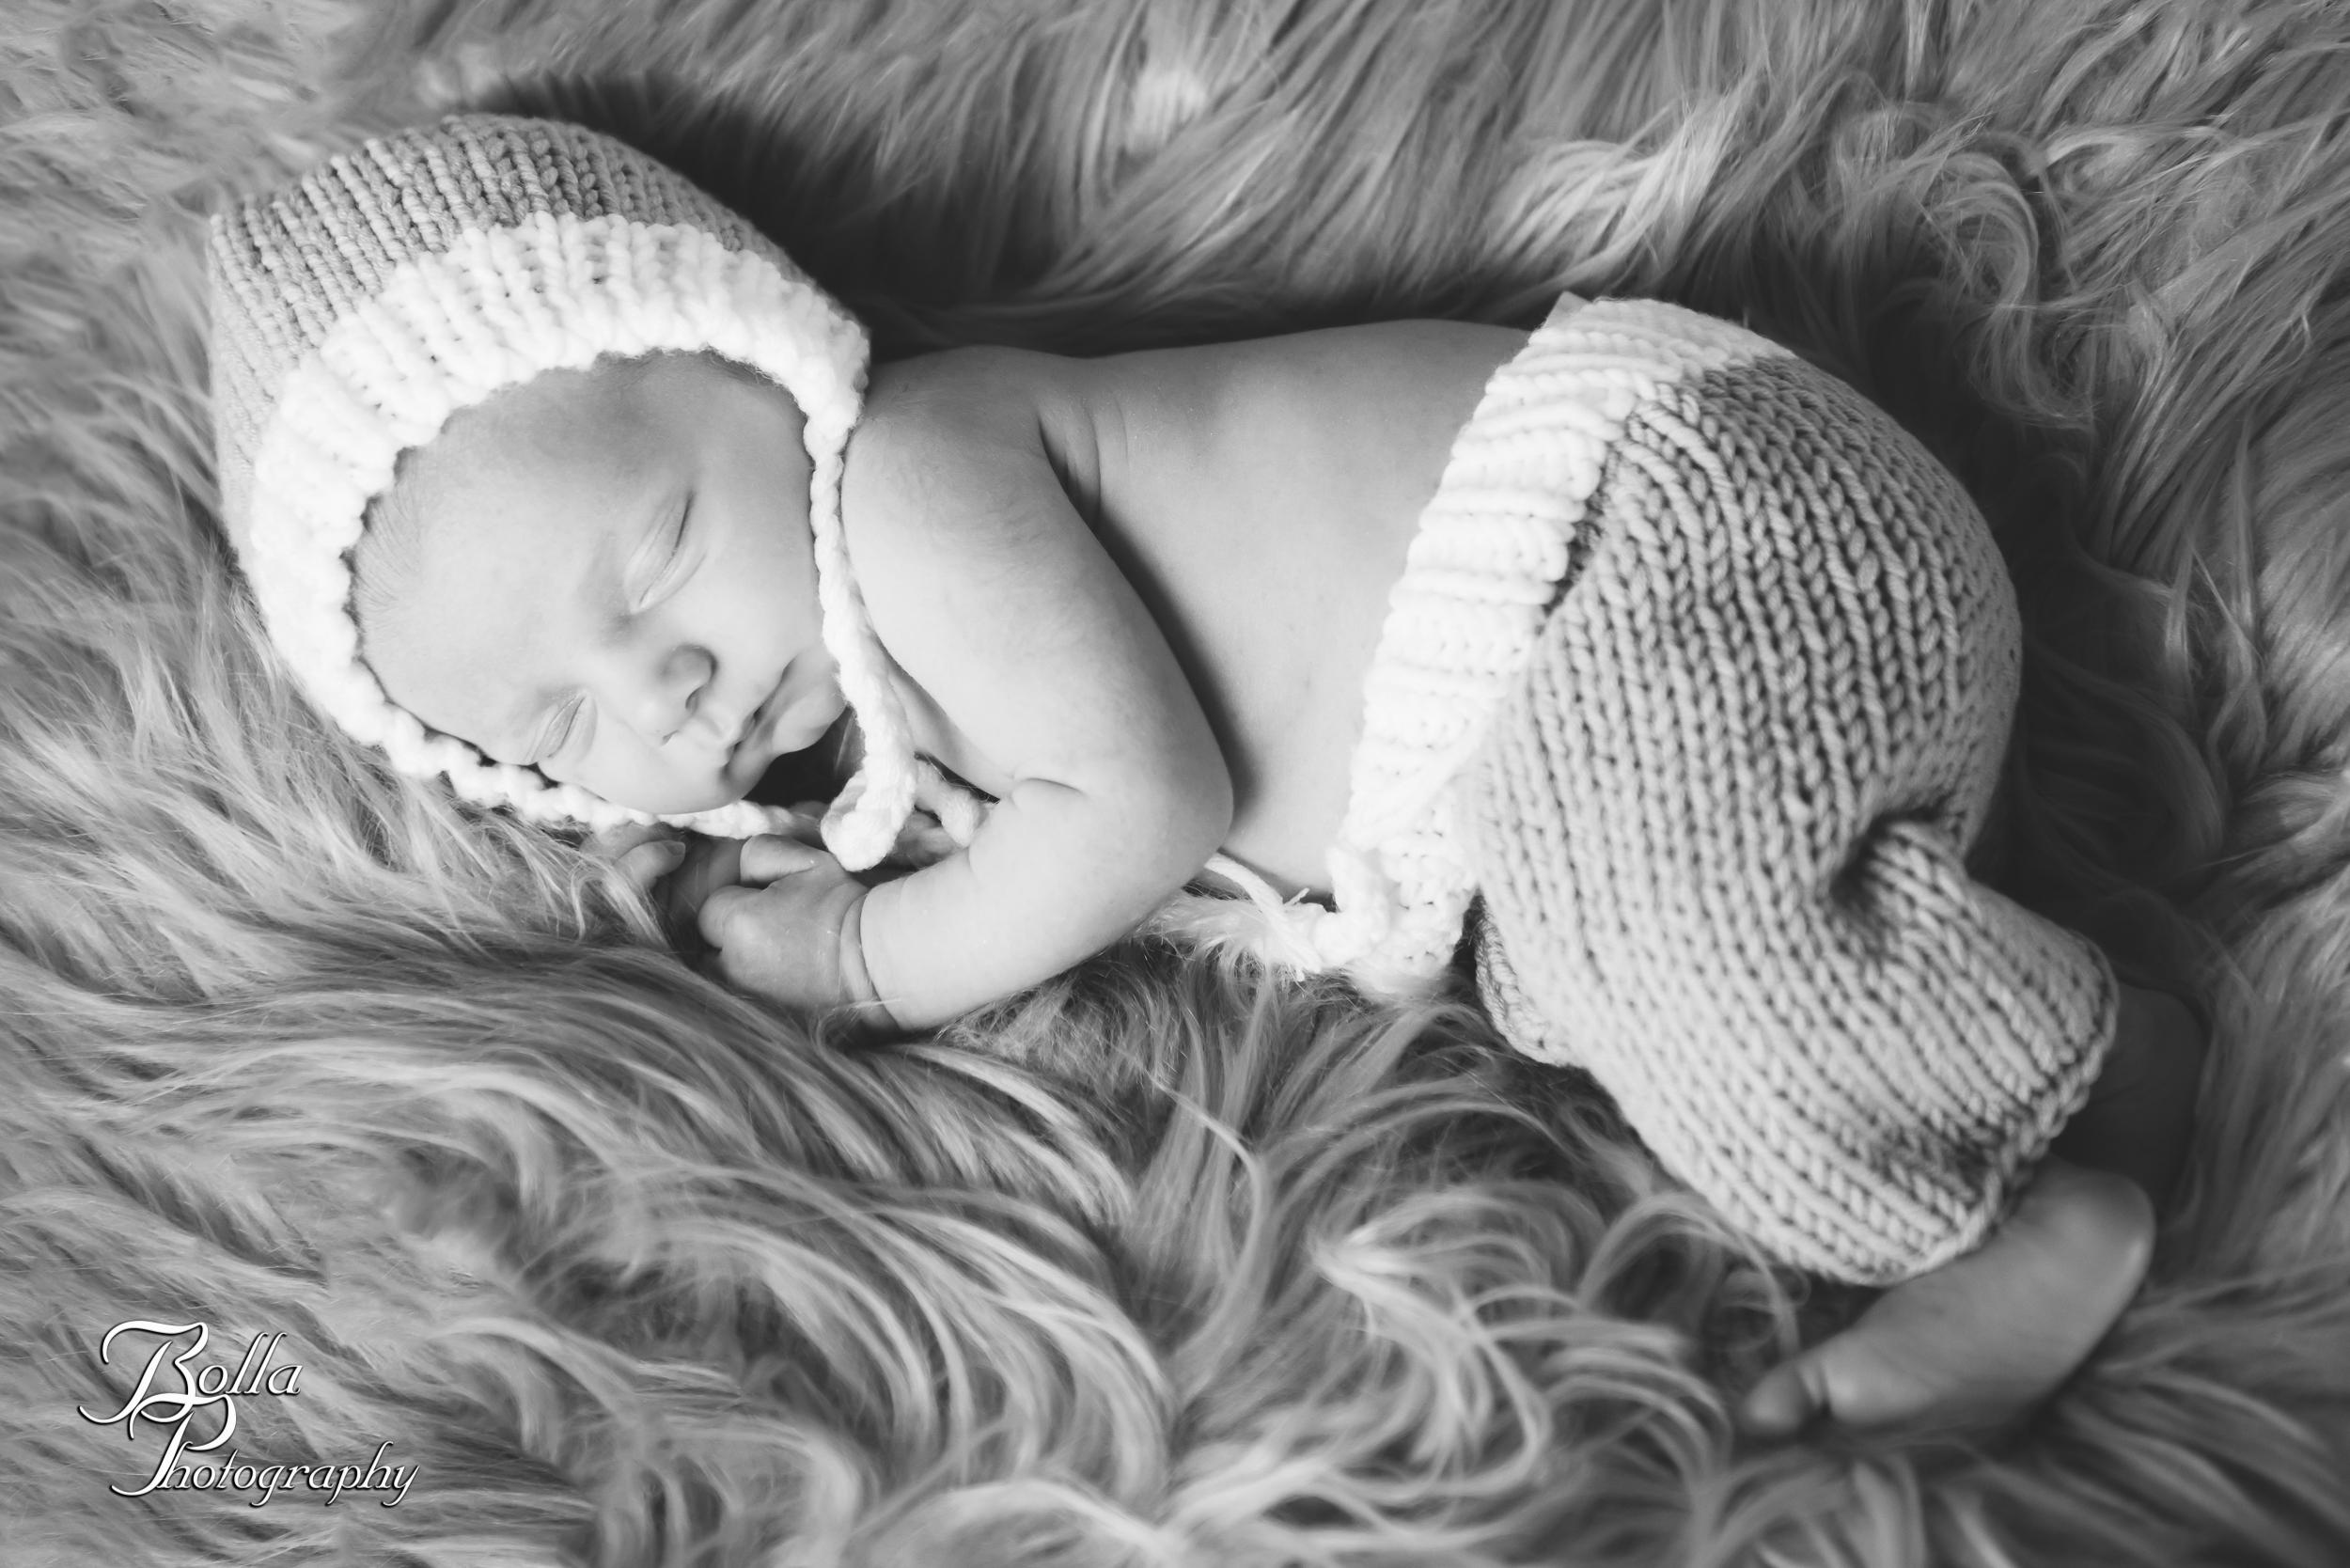 20170414_Bolla photography edwardsville wedding newborn baby photographer st louis weddings babies-2.jpg